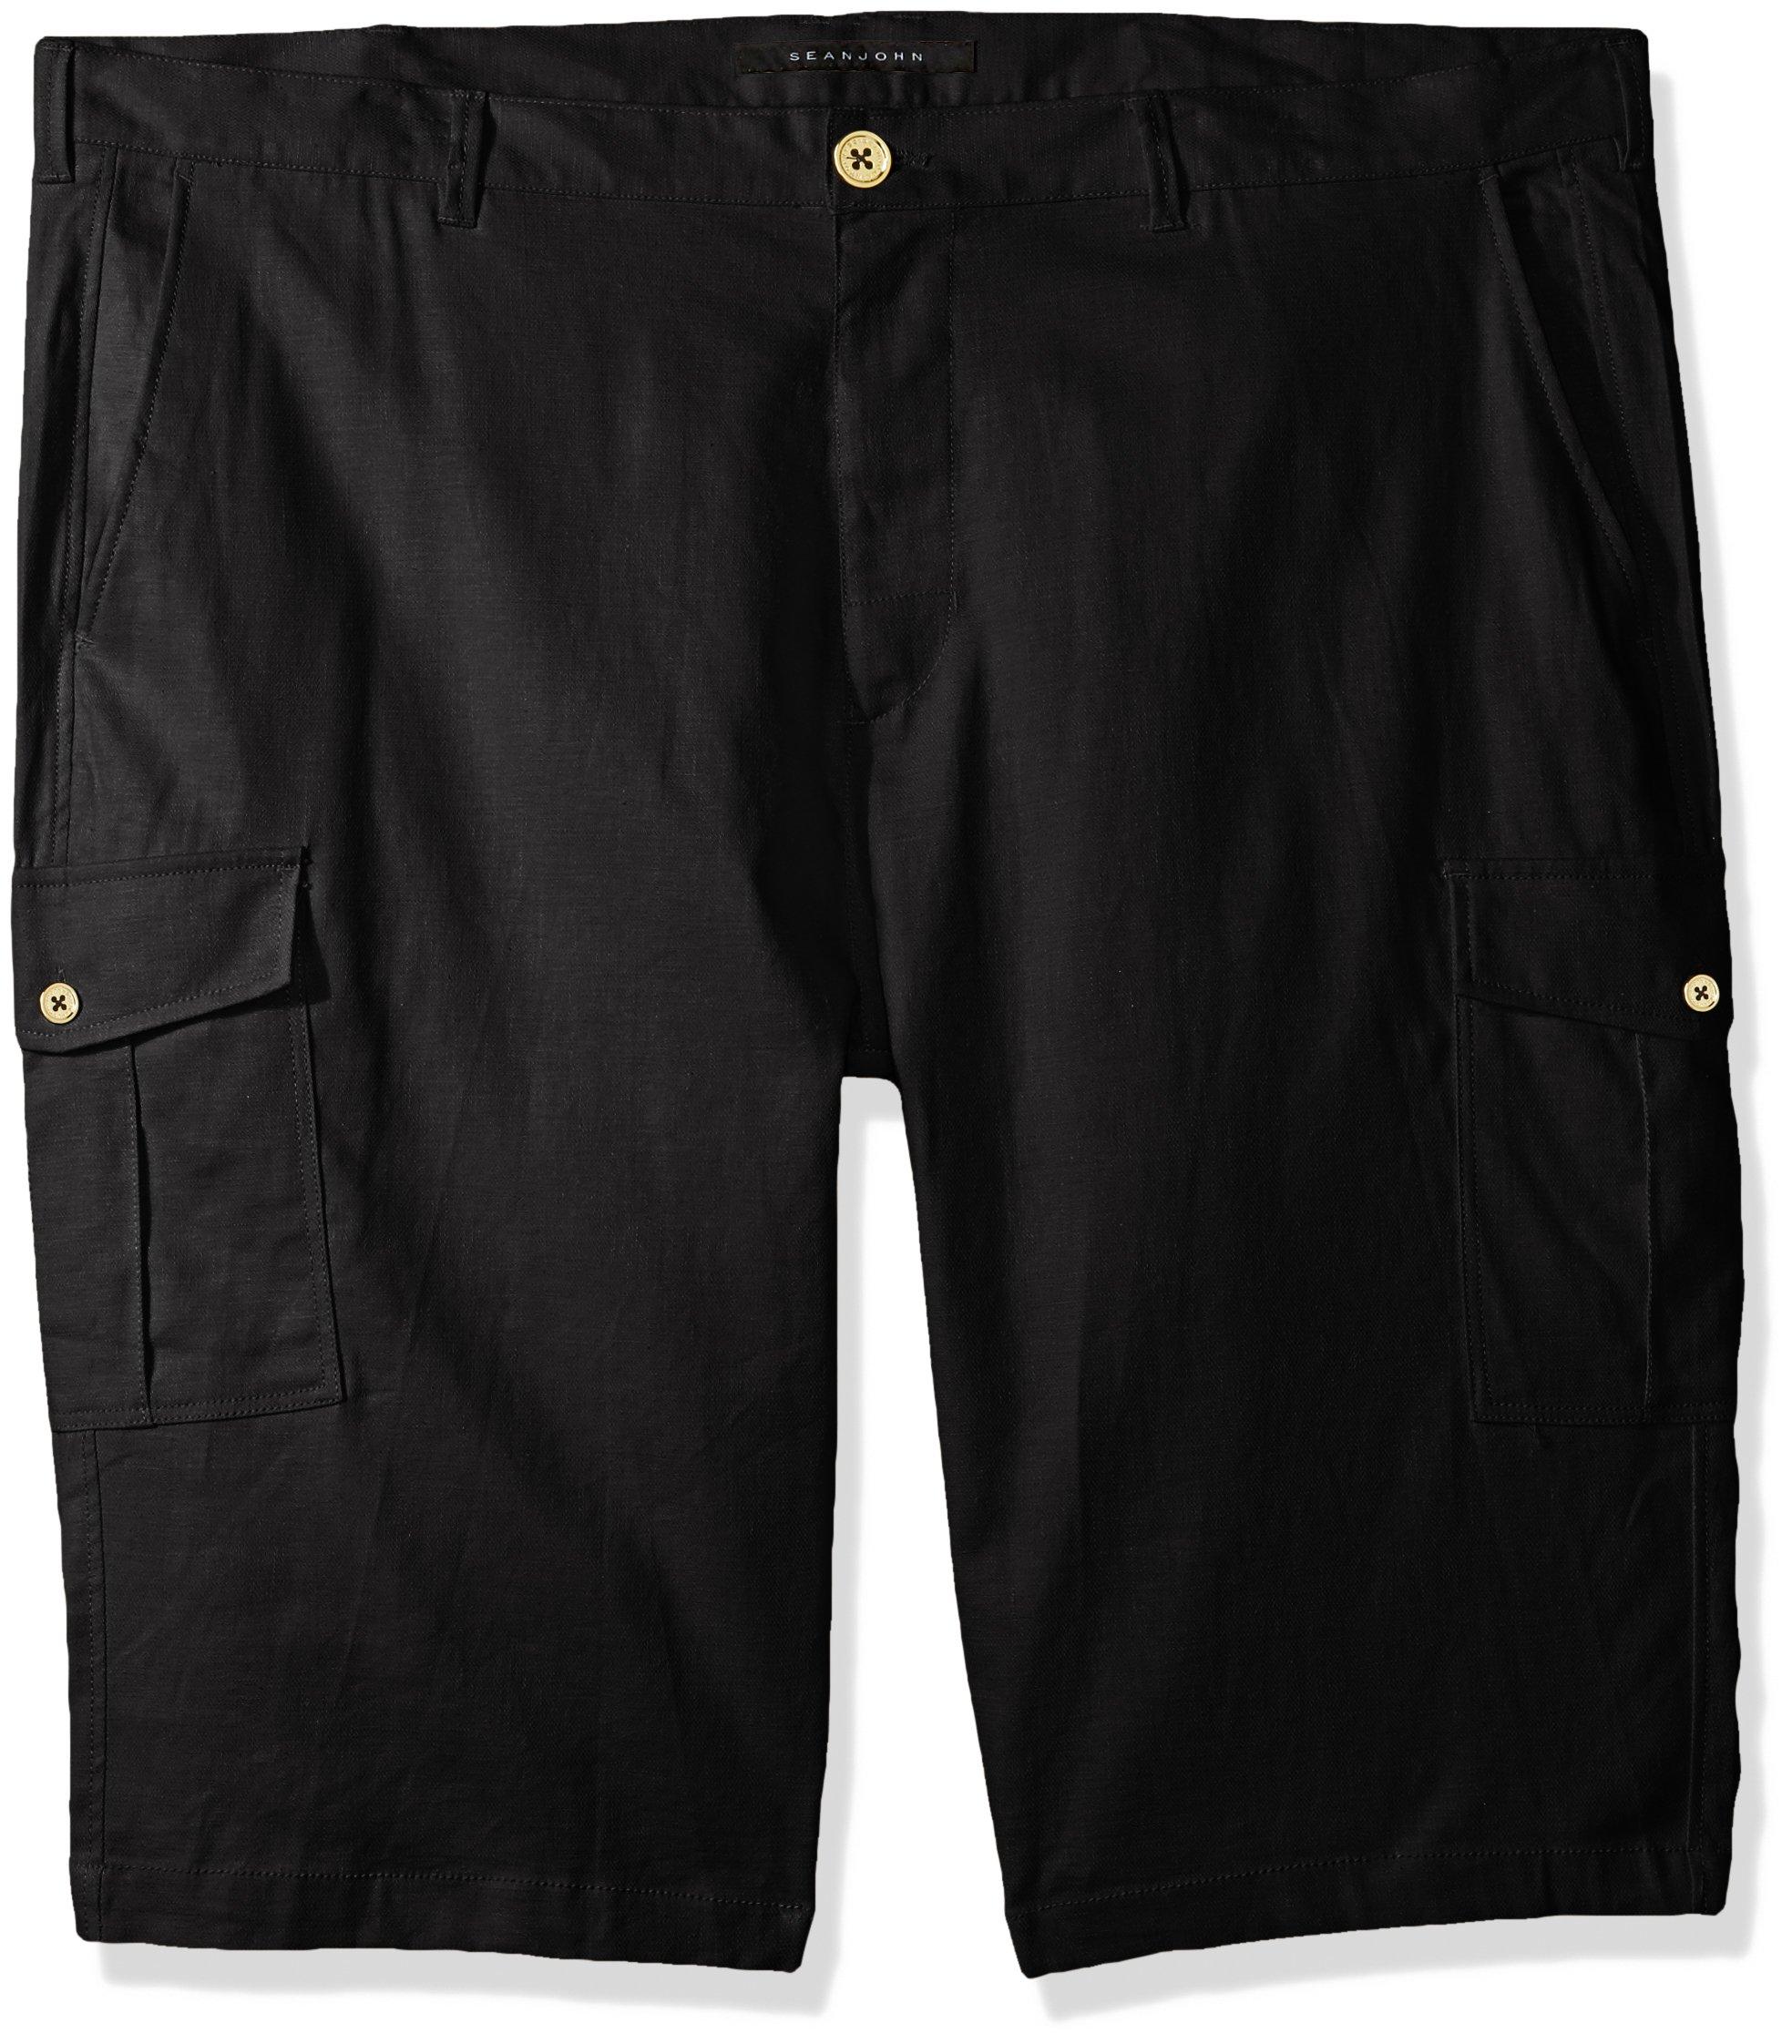 Sean John Men's Tall Size Solid Linen Cargo Shorts, pm Black 40T